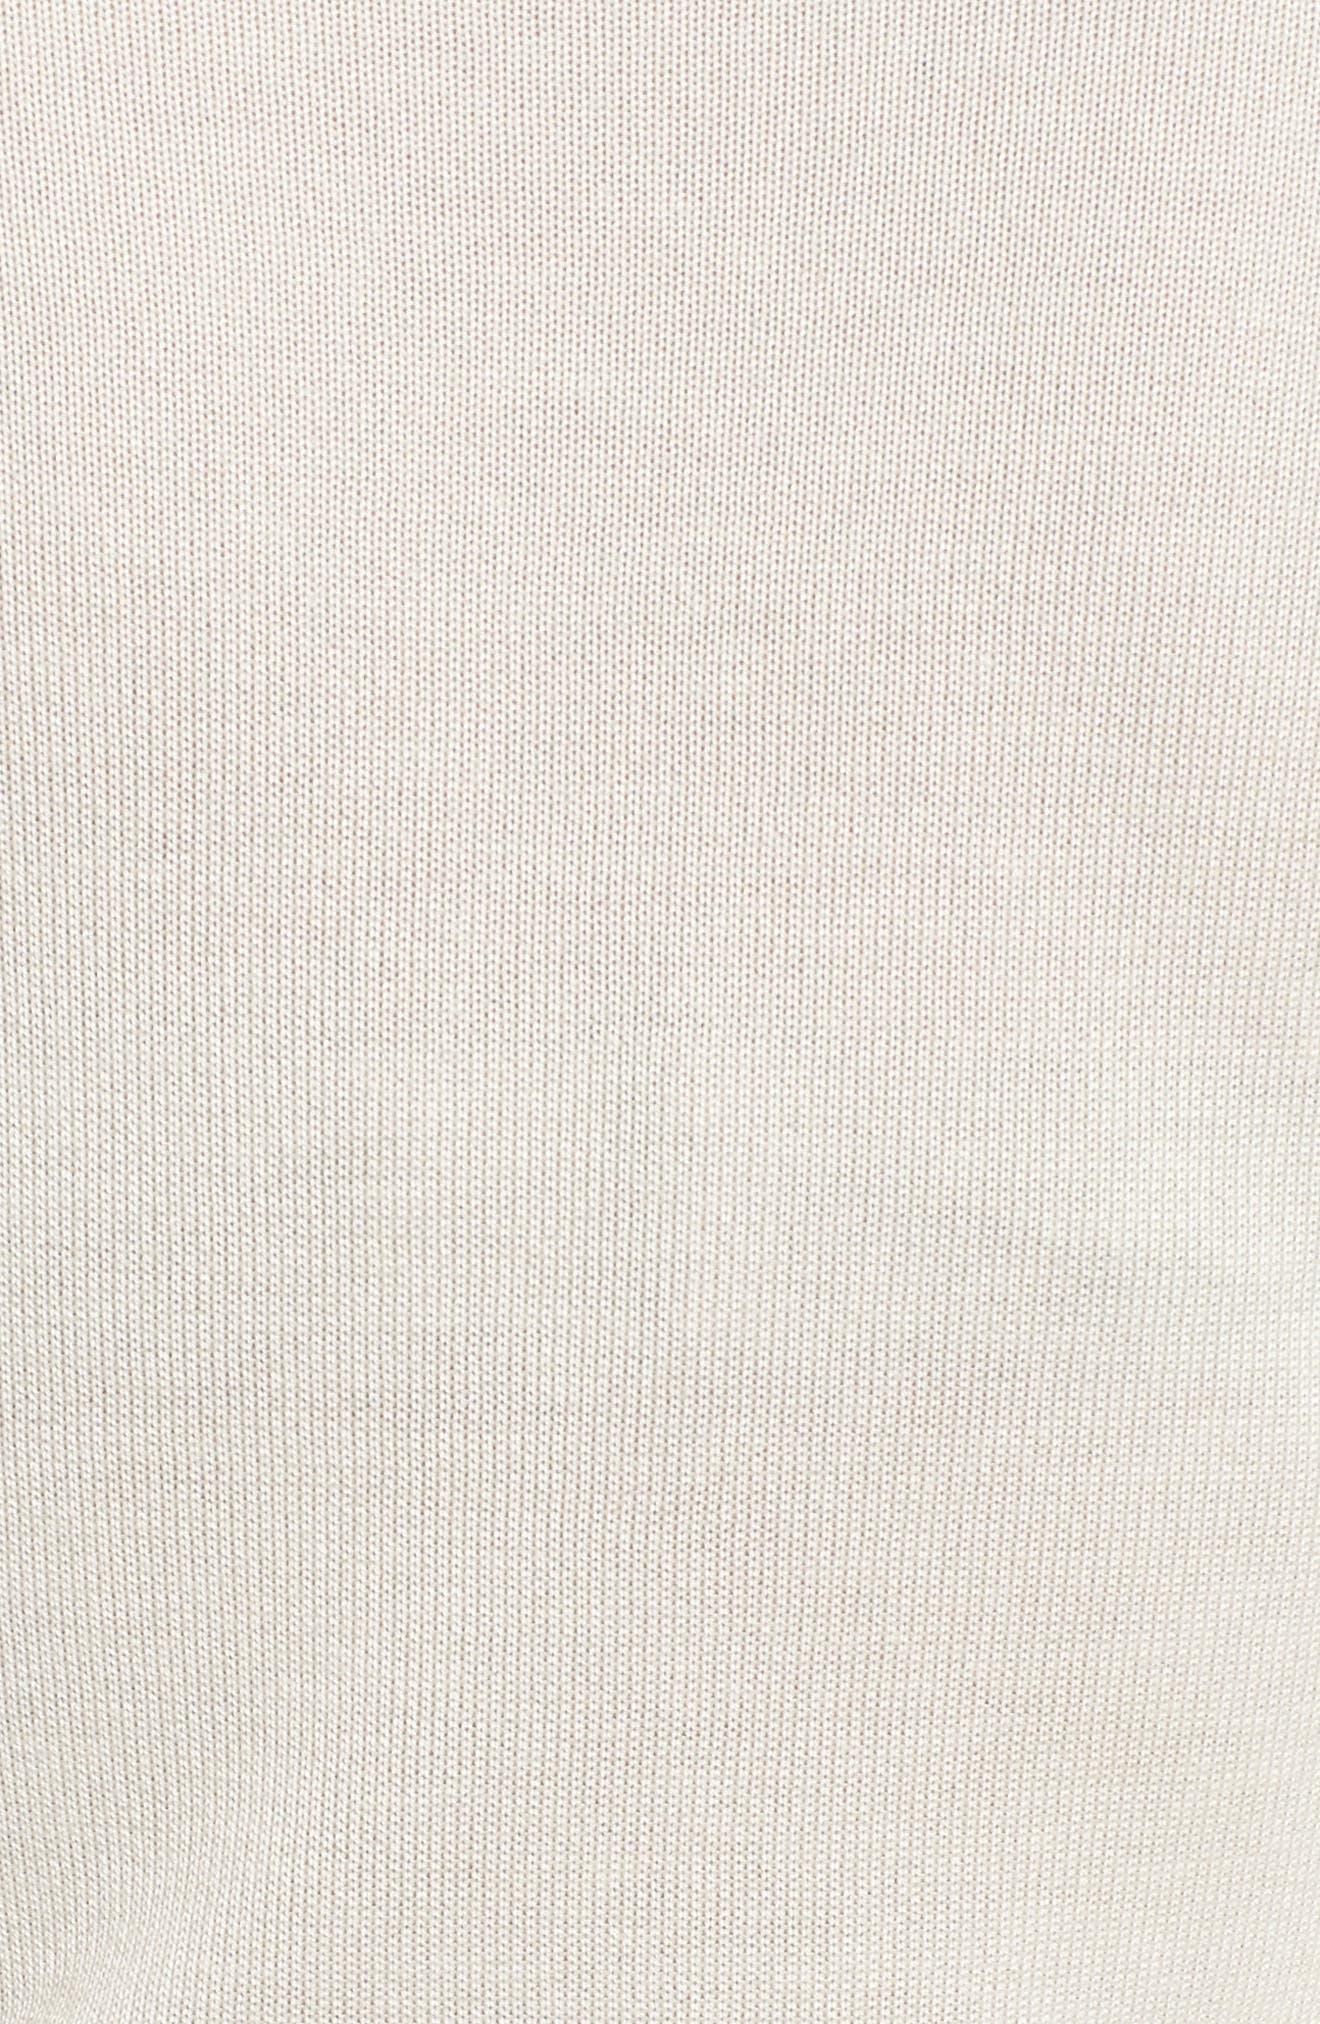 Winnie Tie Neck Sweater,                             Alternate thumbnail 5, color,                             111